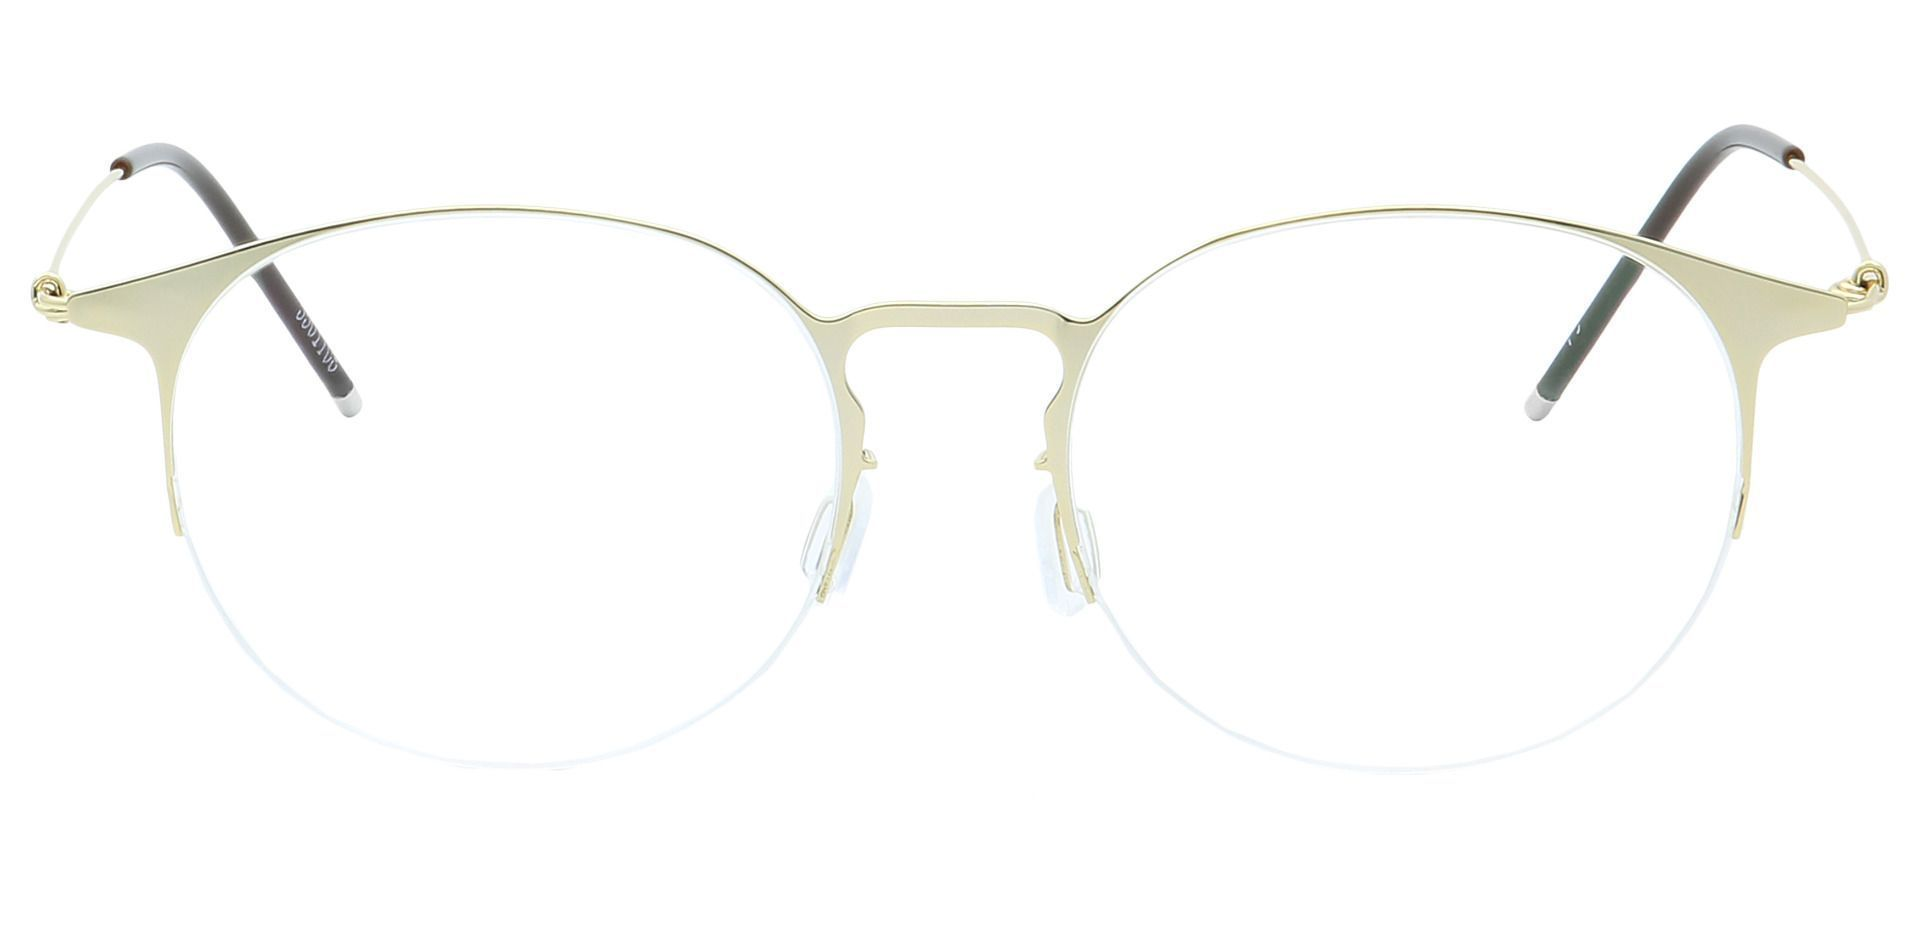 Howie Round Blue Light Blocking Glasses - Yellow